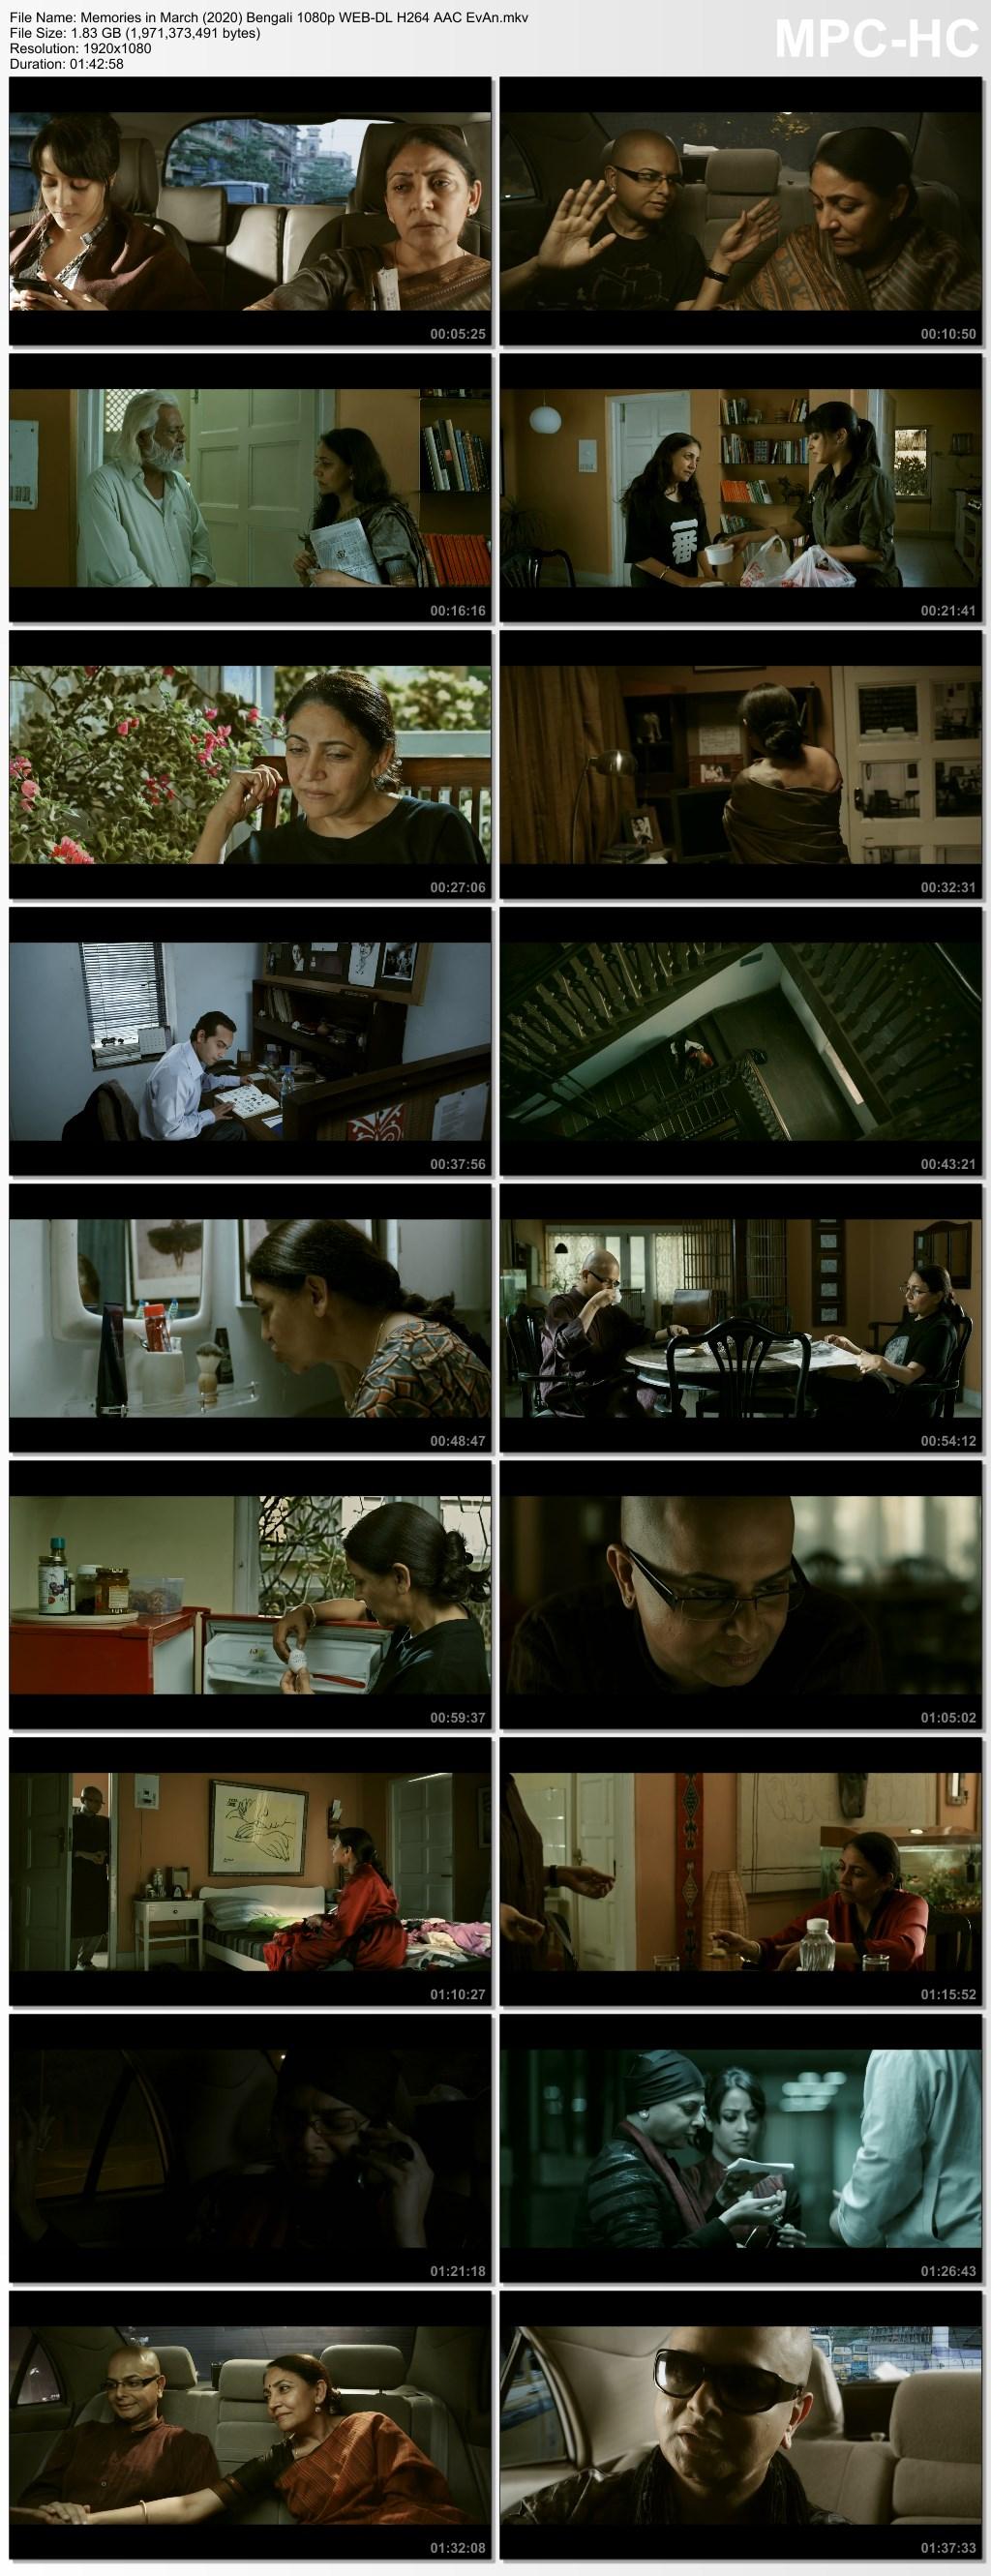 Memories in March (2020) Bengali 1080p WEB DL H264 AAC EvAn.mkv thumbs [2020.06.05 06.04.04]